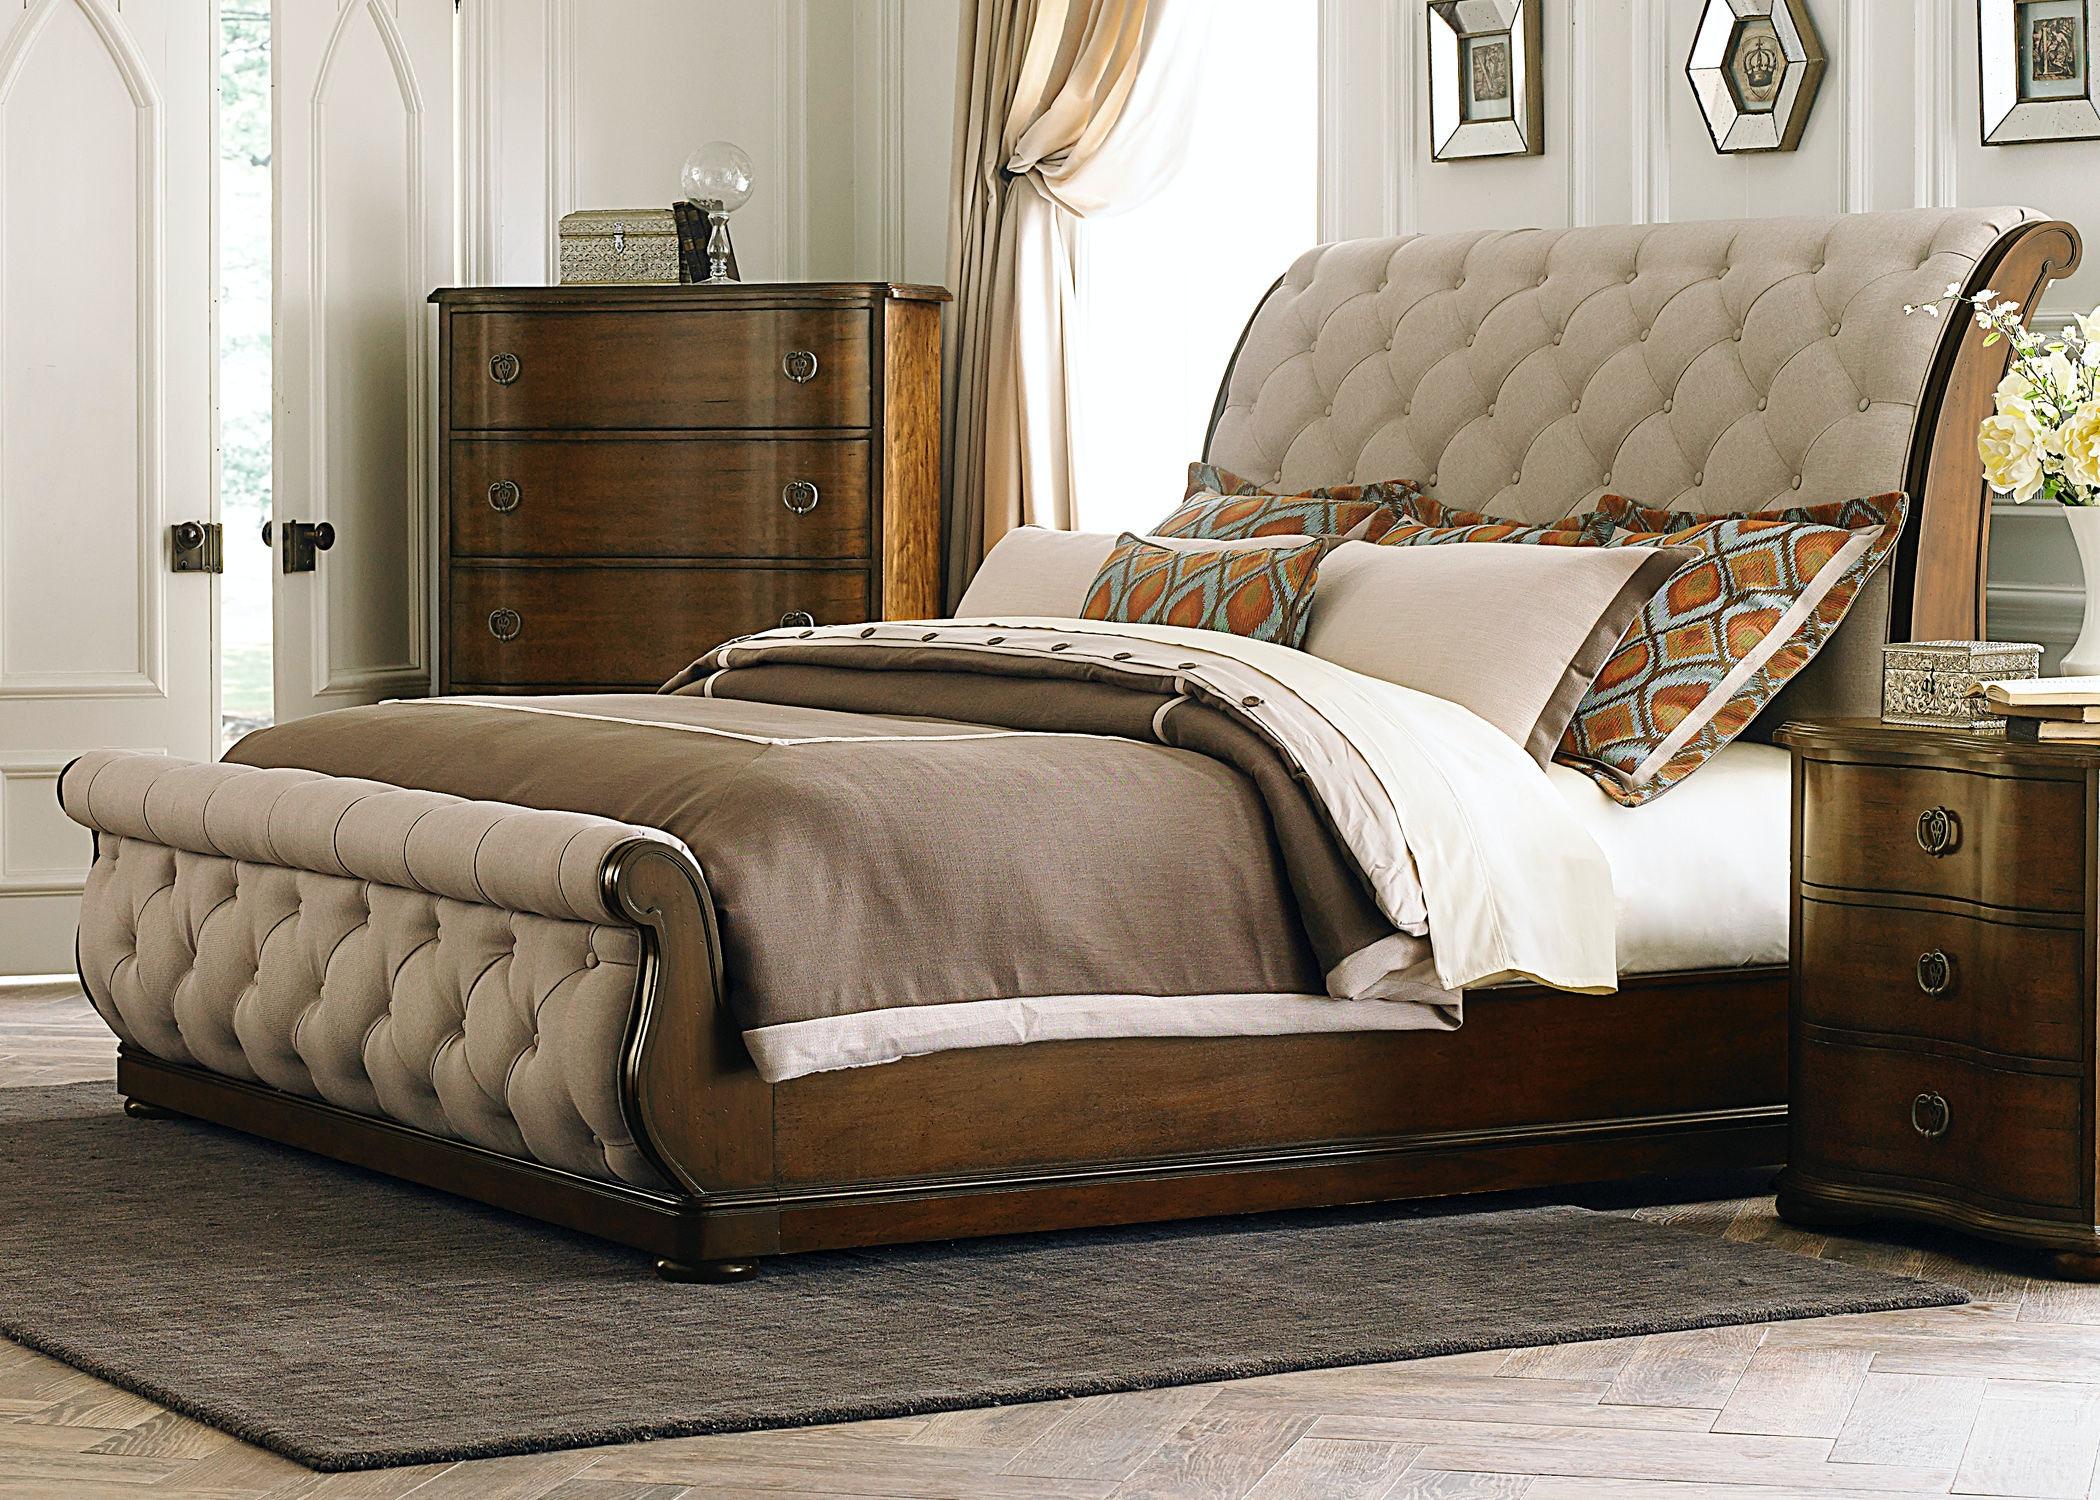 Perfect Liberty Furniture Bedroom King Uph Sleigh Footboard 545 BR22F At Waltman  Furniture